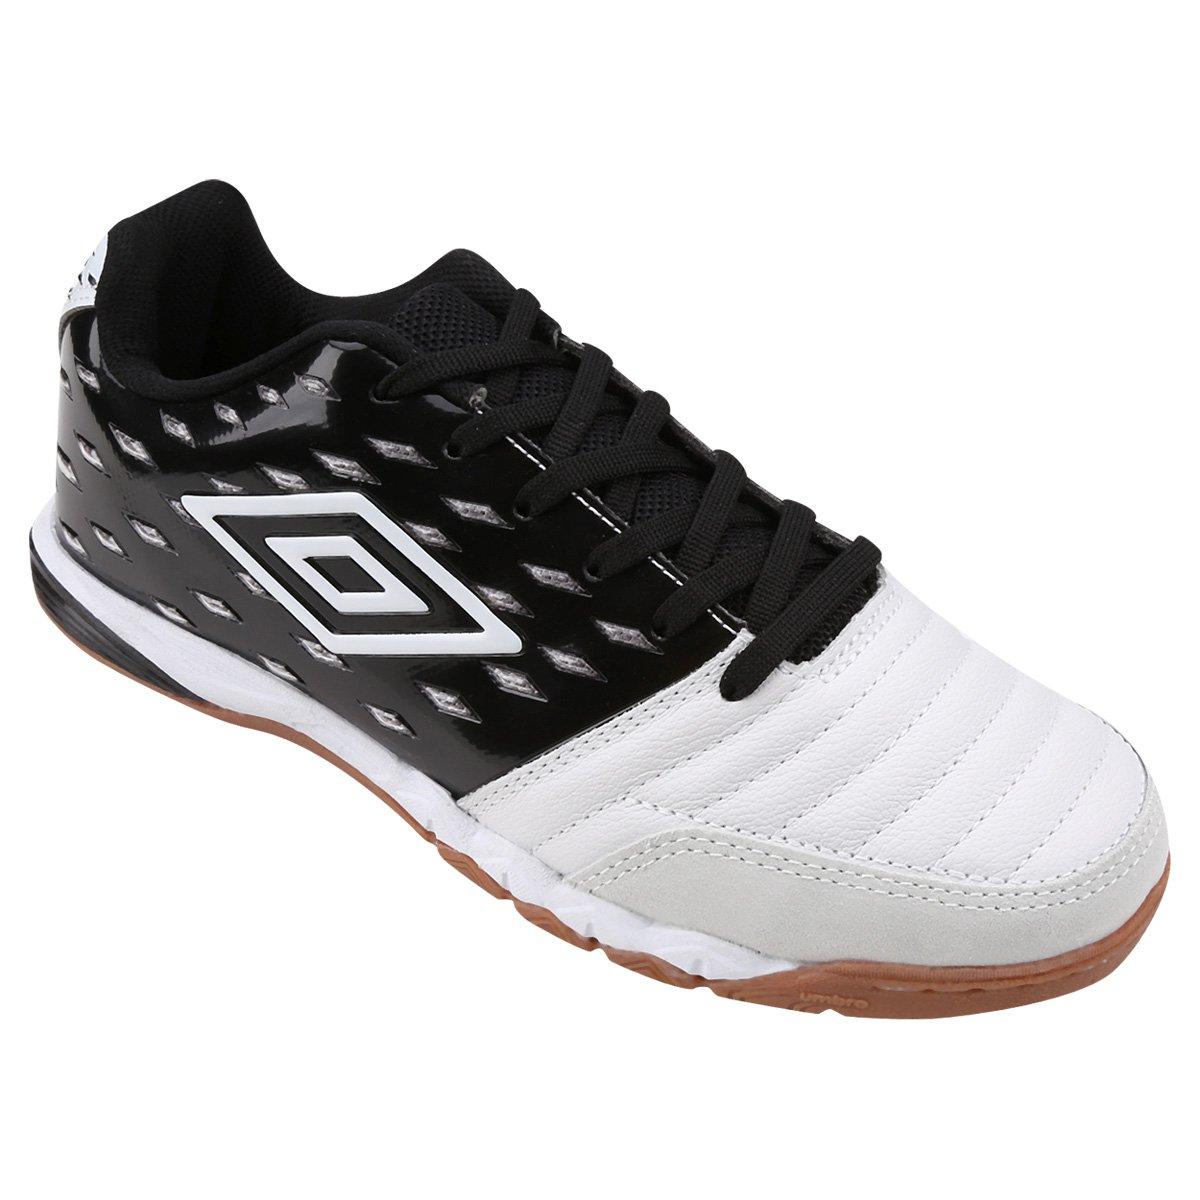 Chuteira Futsal Umbro Stratus Pro - Preto e Branco - Compre Agora ... b619ca828e541